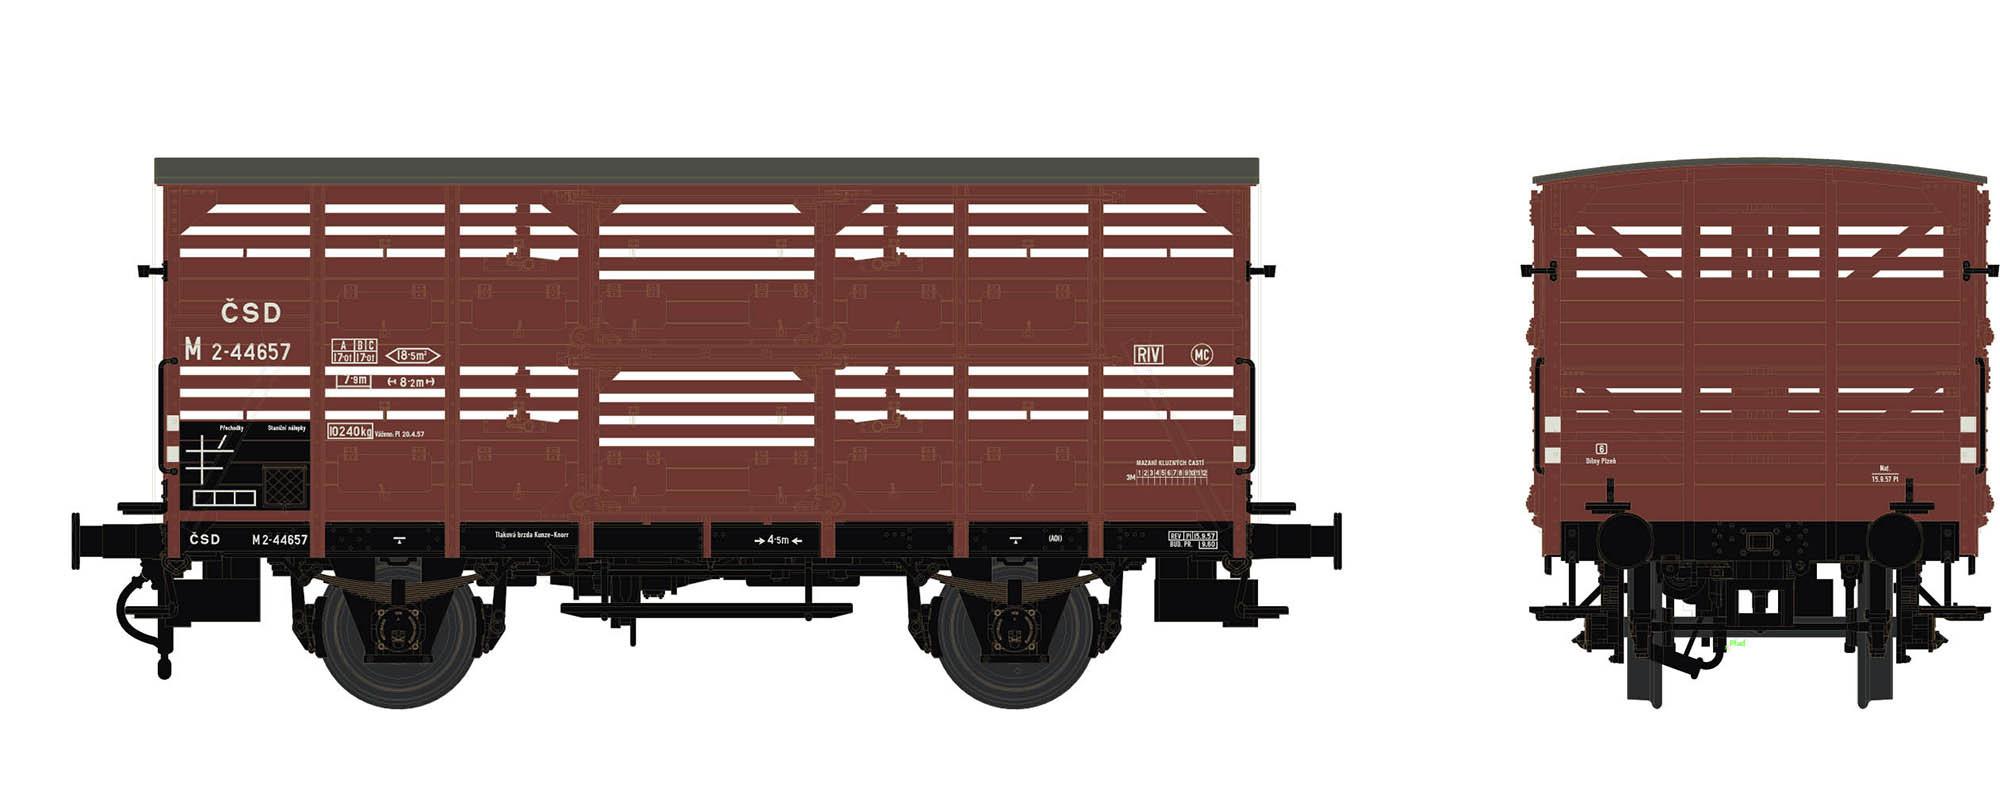 Wagenbausatz Verschlagwagen Vh14, ČSD, Epoche III